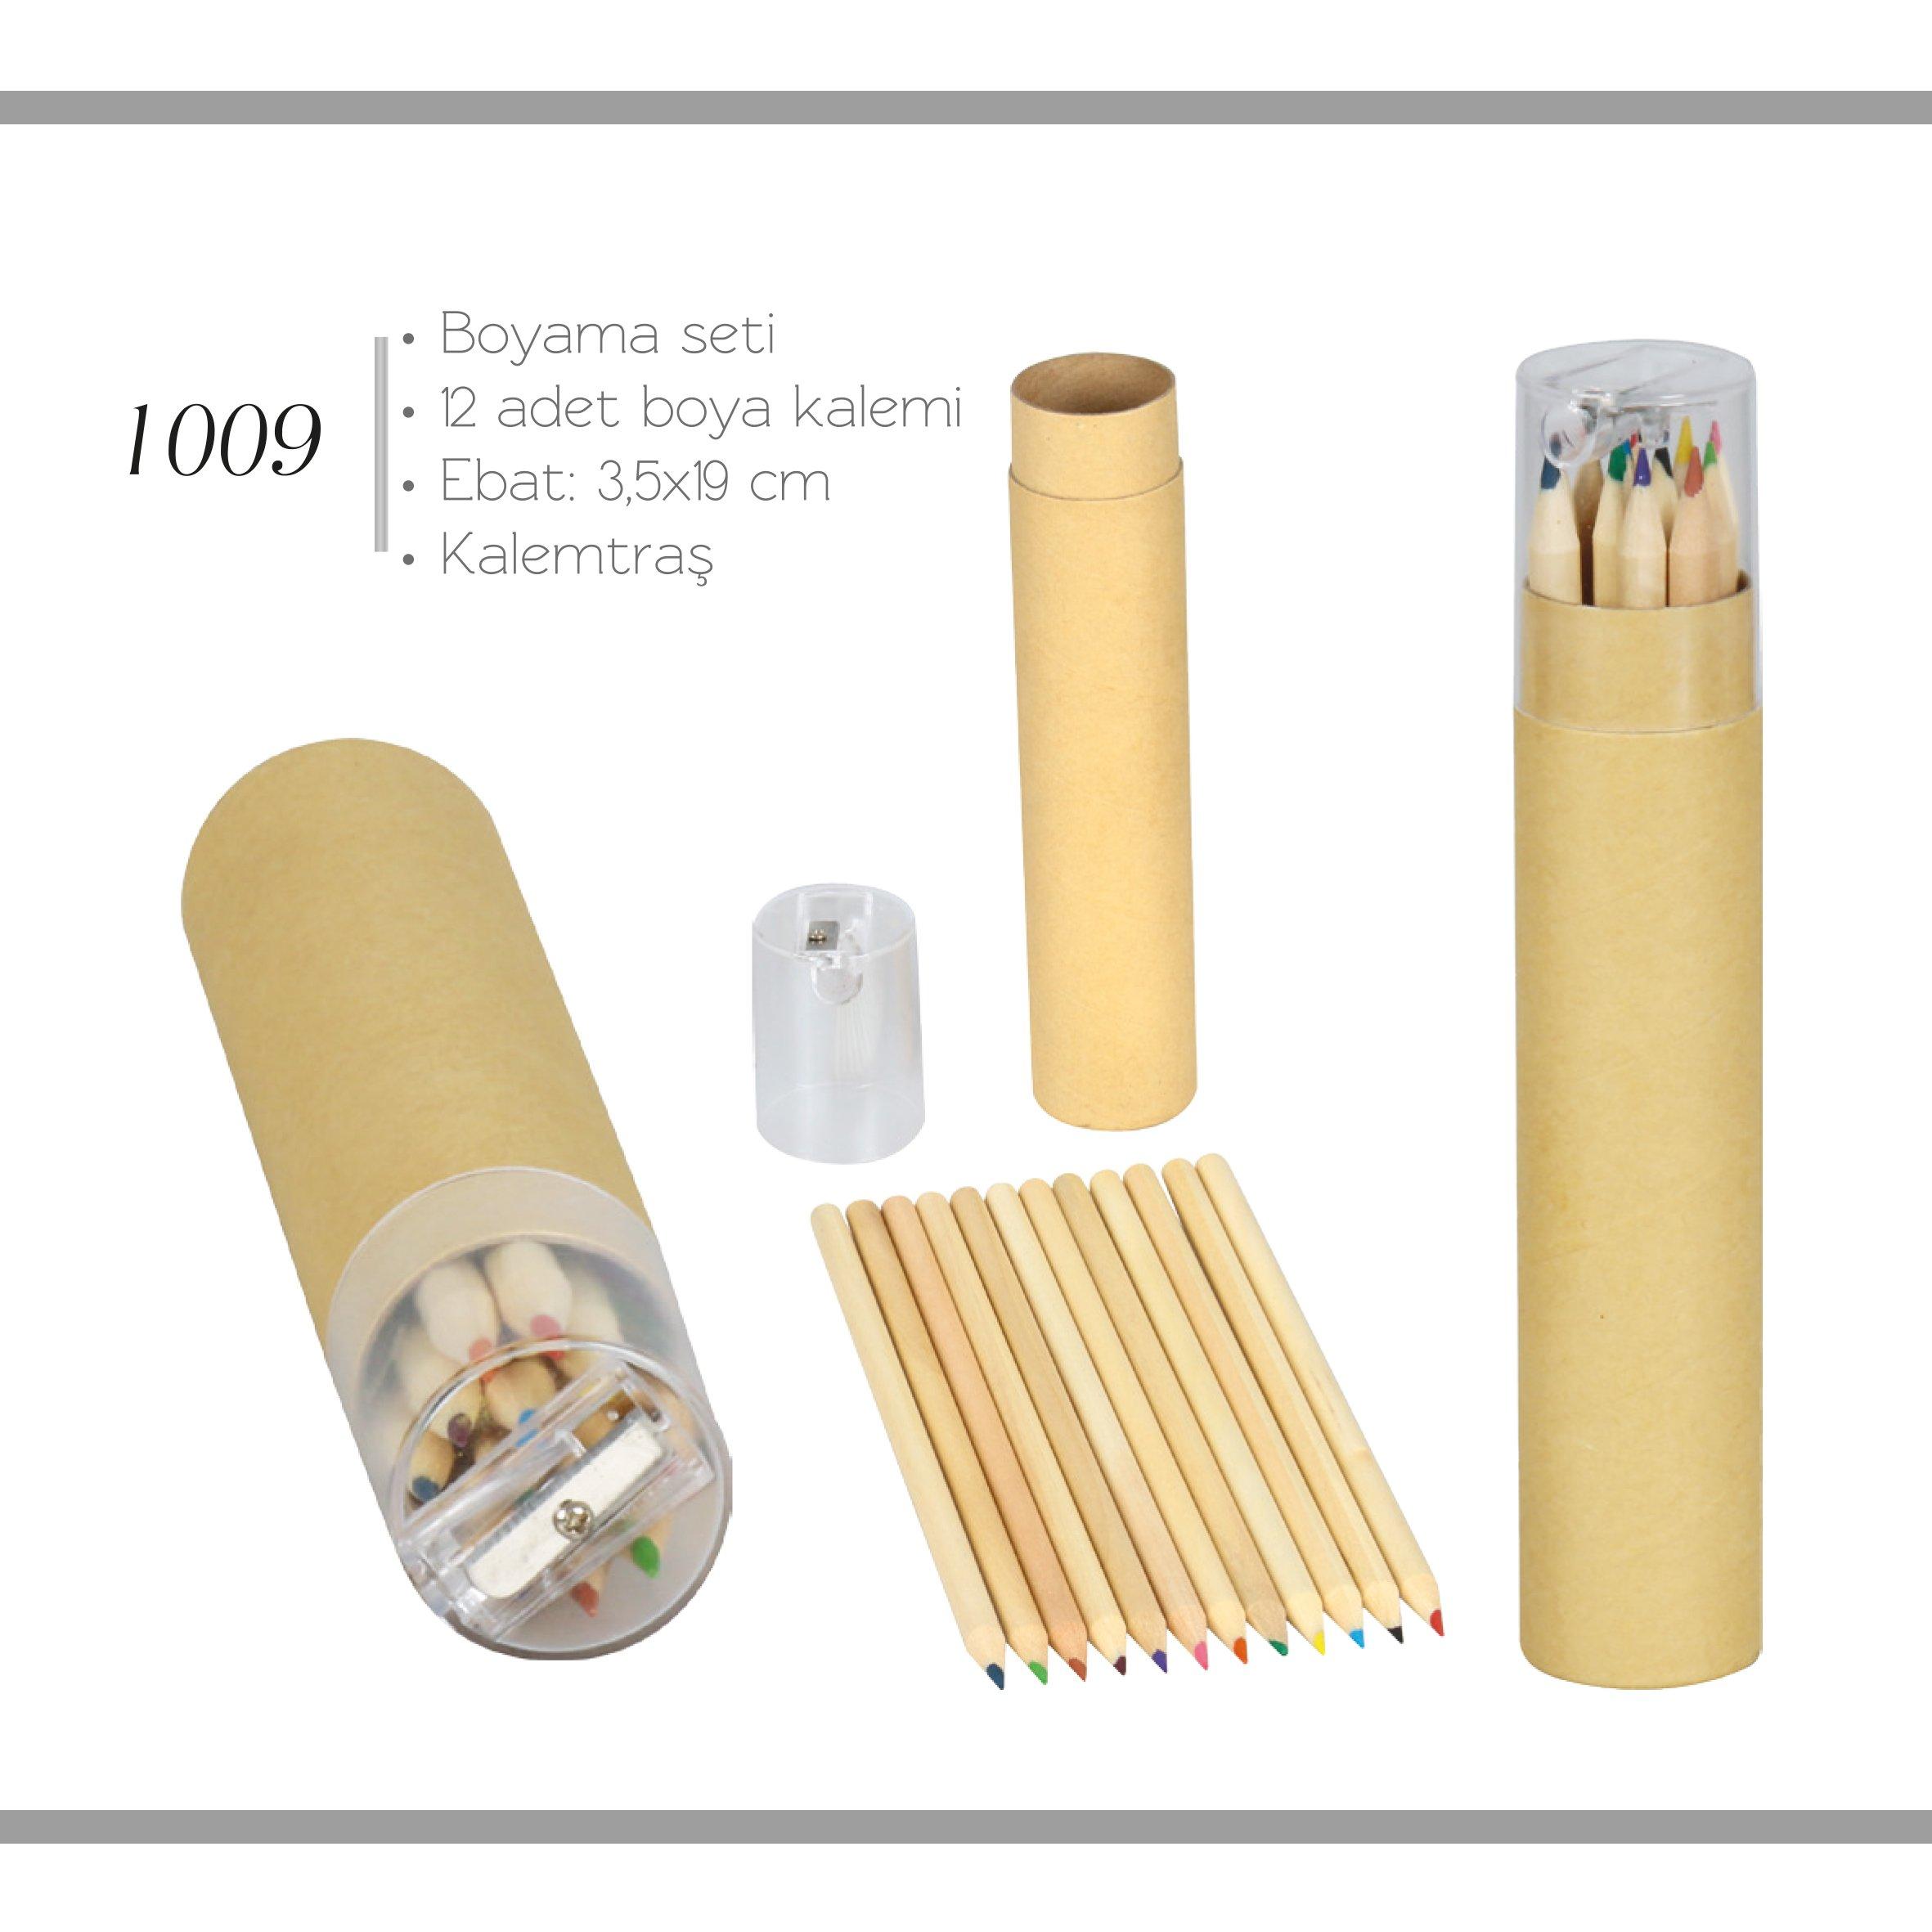 promosyon-promosyon ürünleri-promosyon kalemler-kurşun kalemler-promosyon ahşap kurşun kalem seti 1009